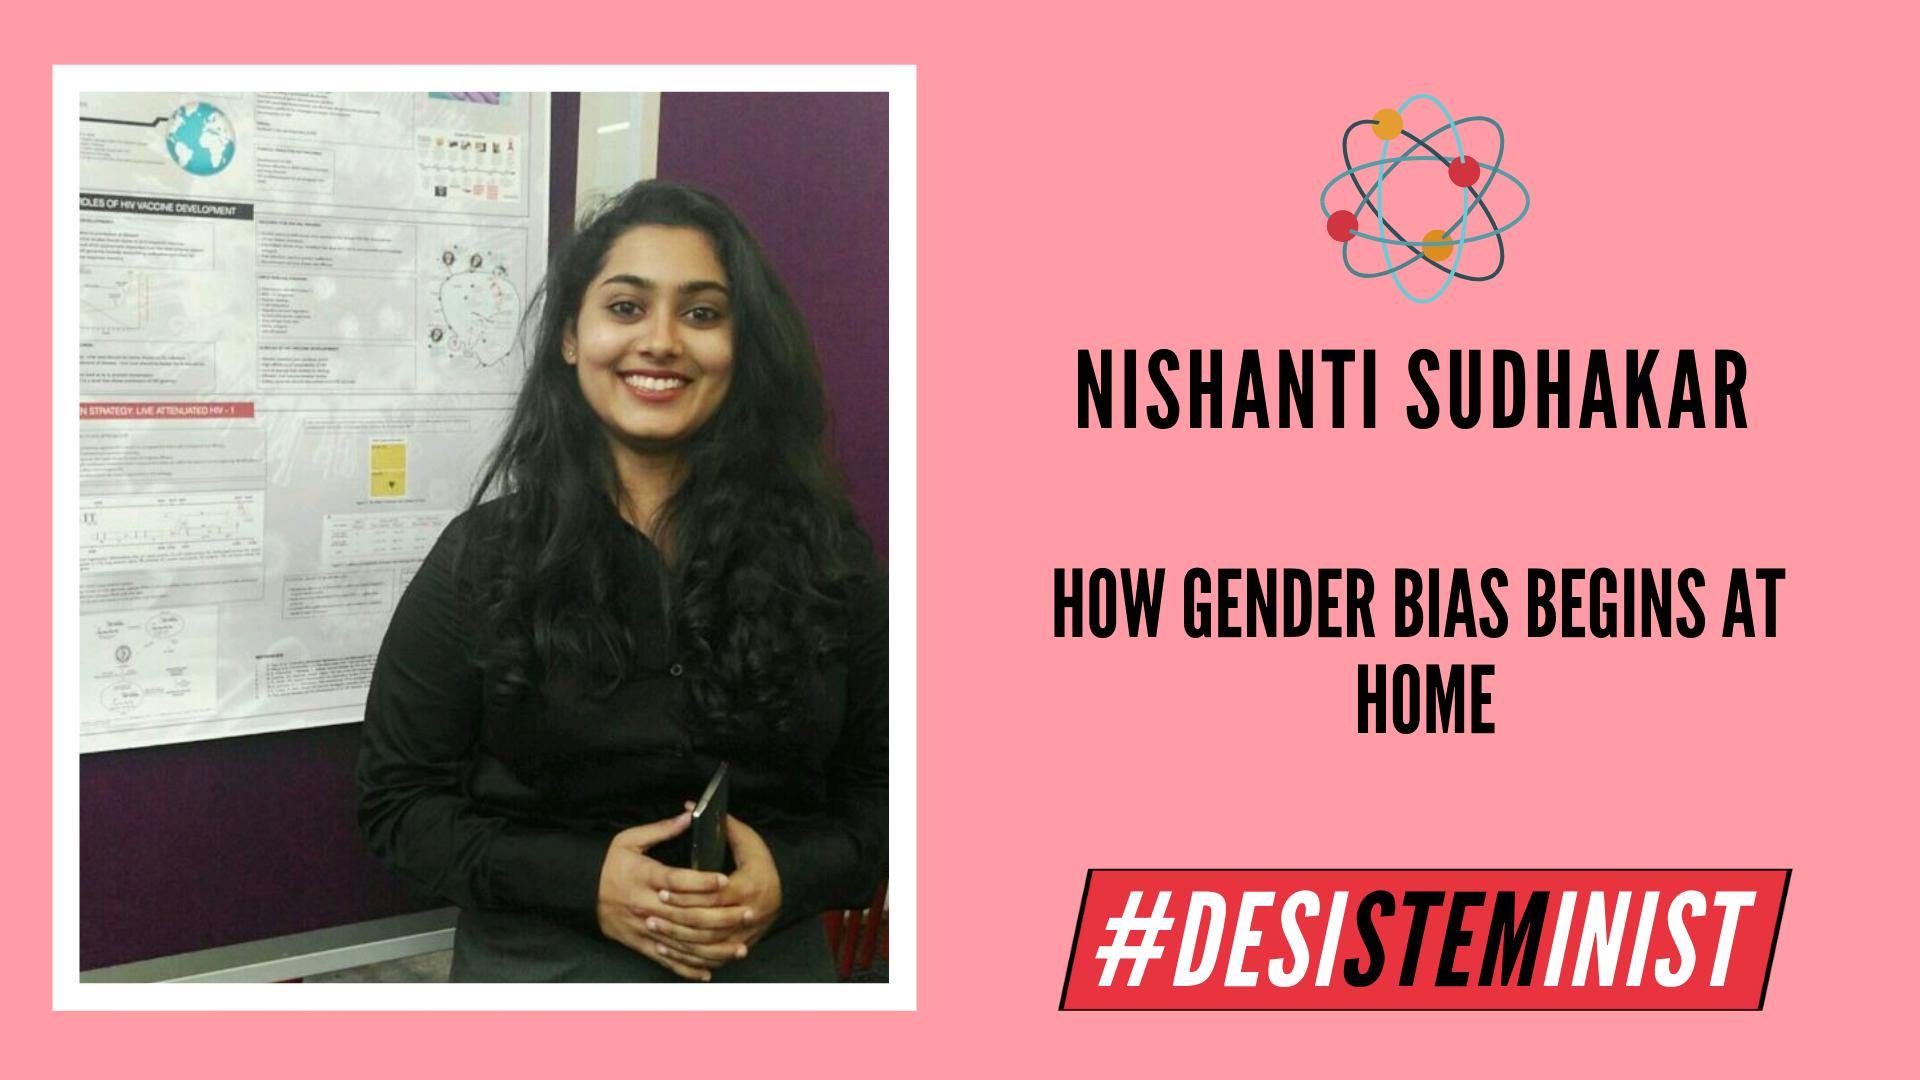 Nishanti Sudhakar On How Gender Bias Begins At Home | #DesiSTEMinist